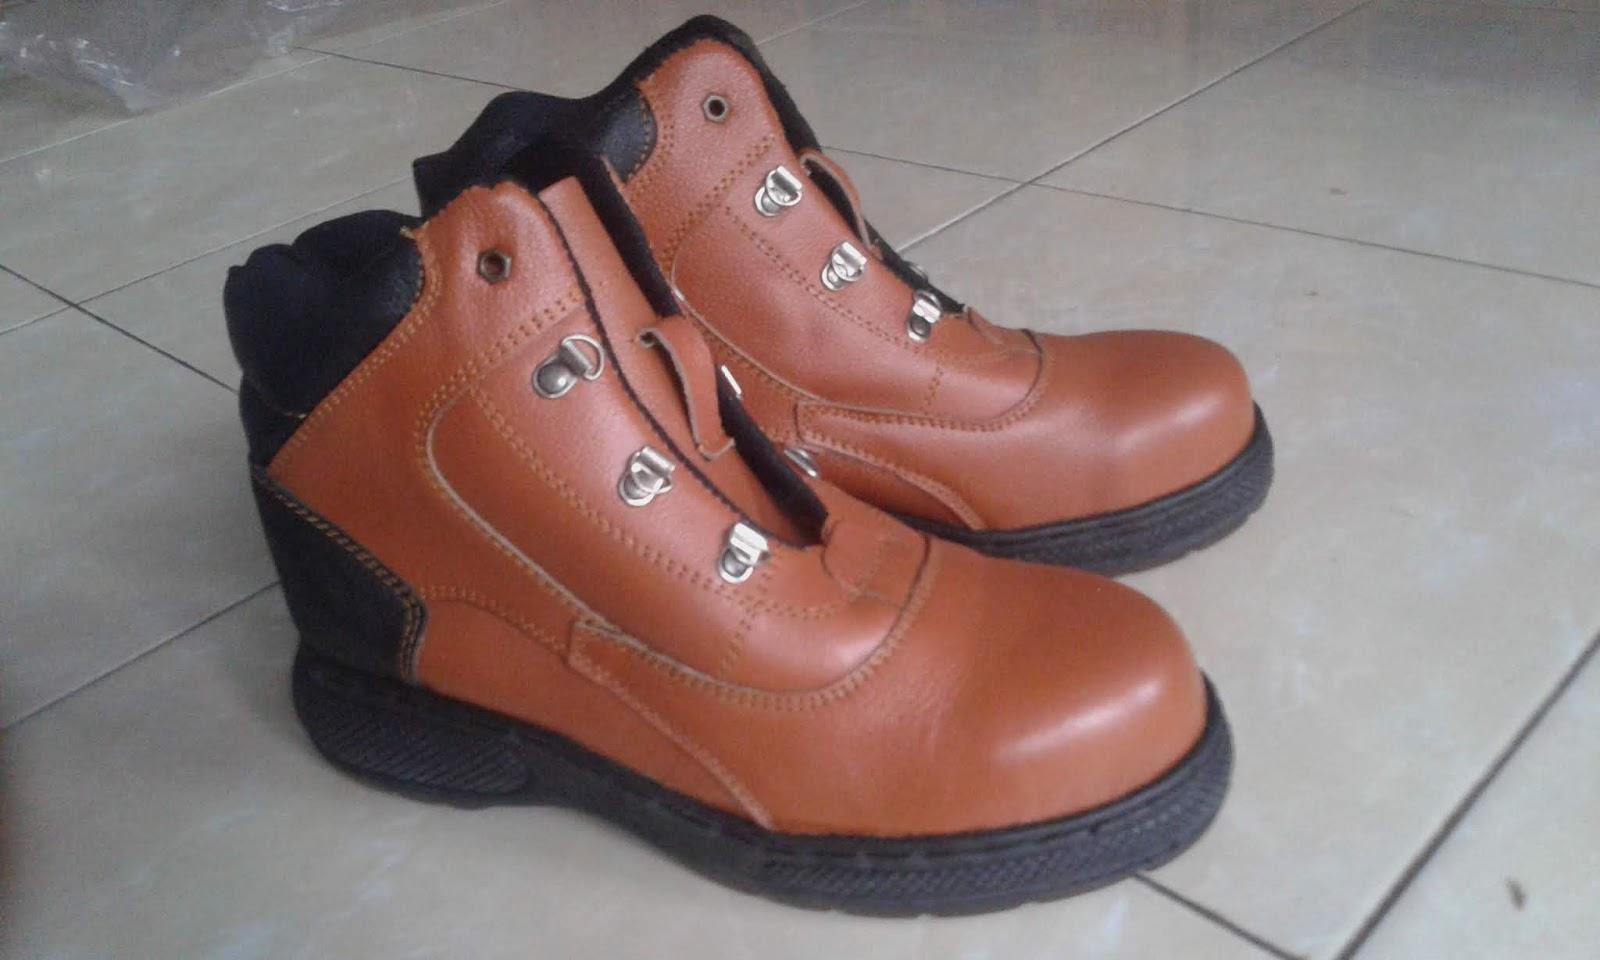 Kami Berkah Mulia Group Melayani Penjualan GROSIR maupun ECERAN model sepatu  safety warna hitam c5b8bca245